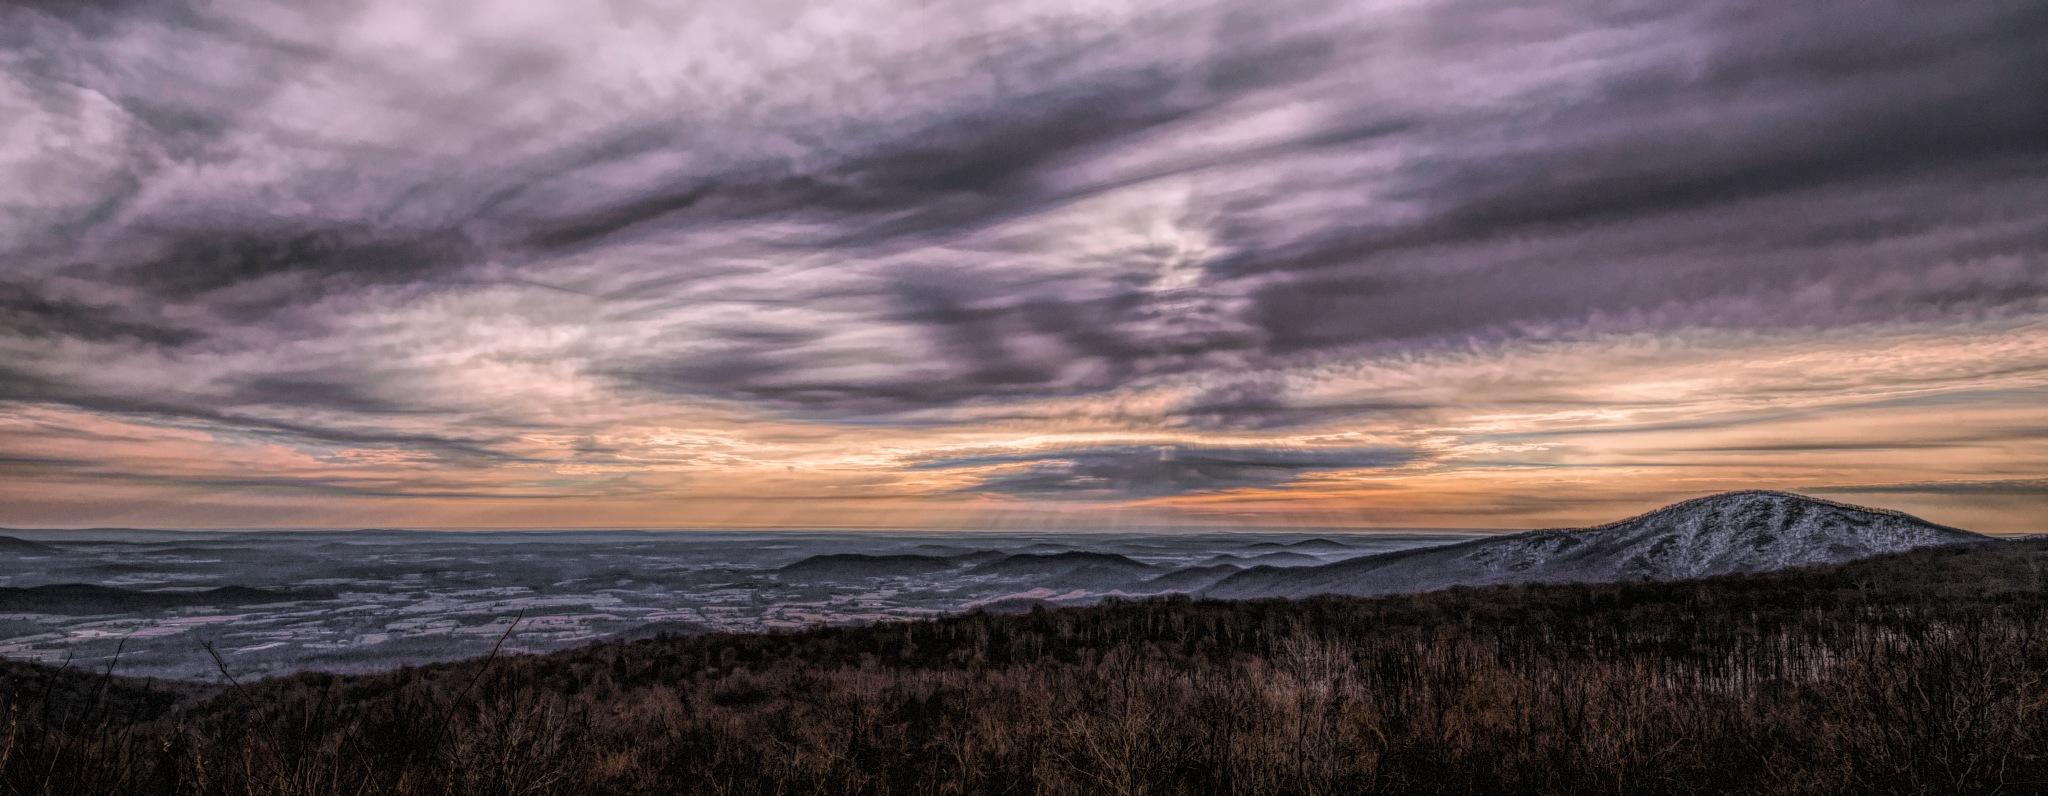 Winter Sky - Shenandoah National Park by JohnEllingson